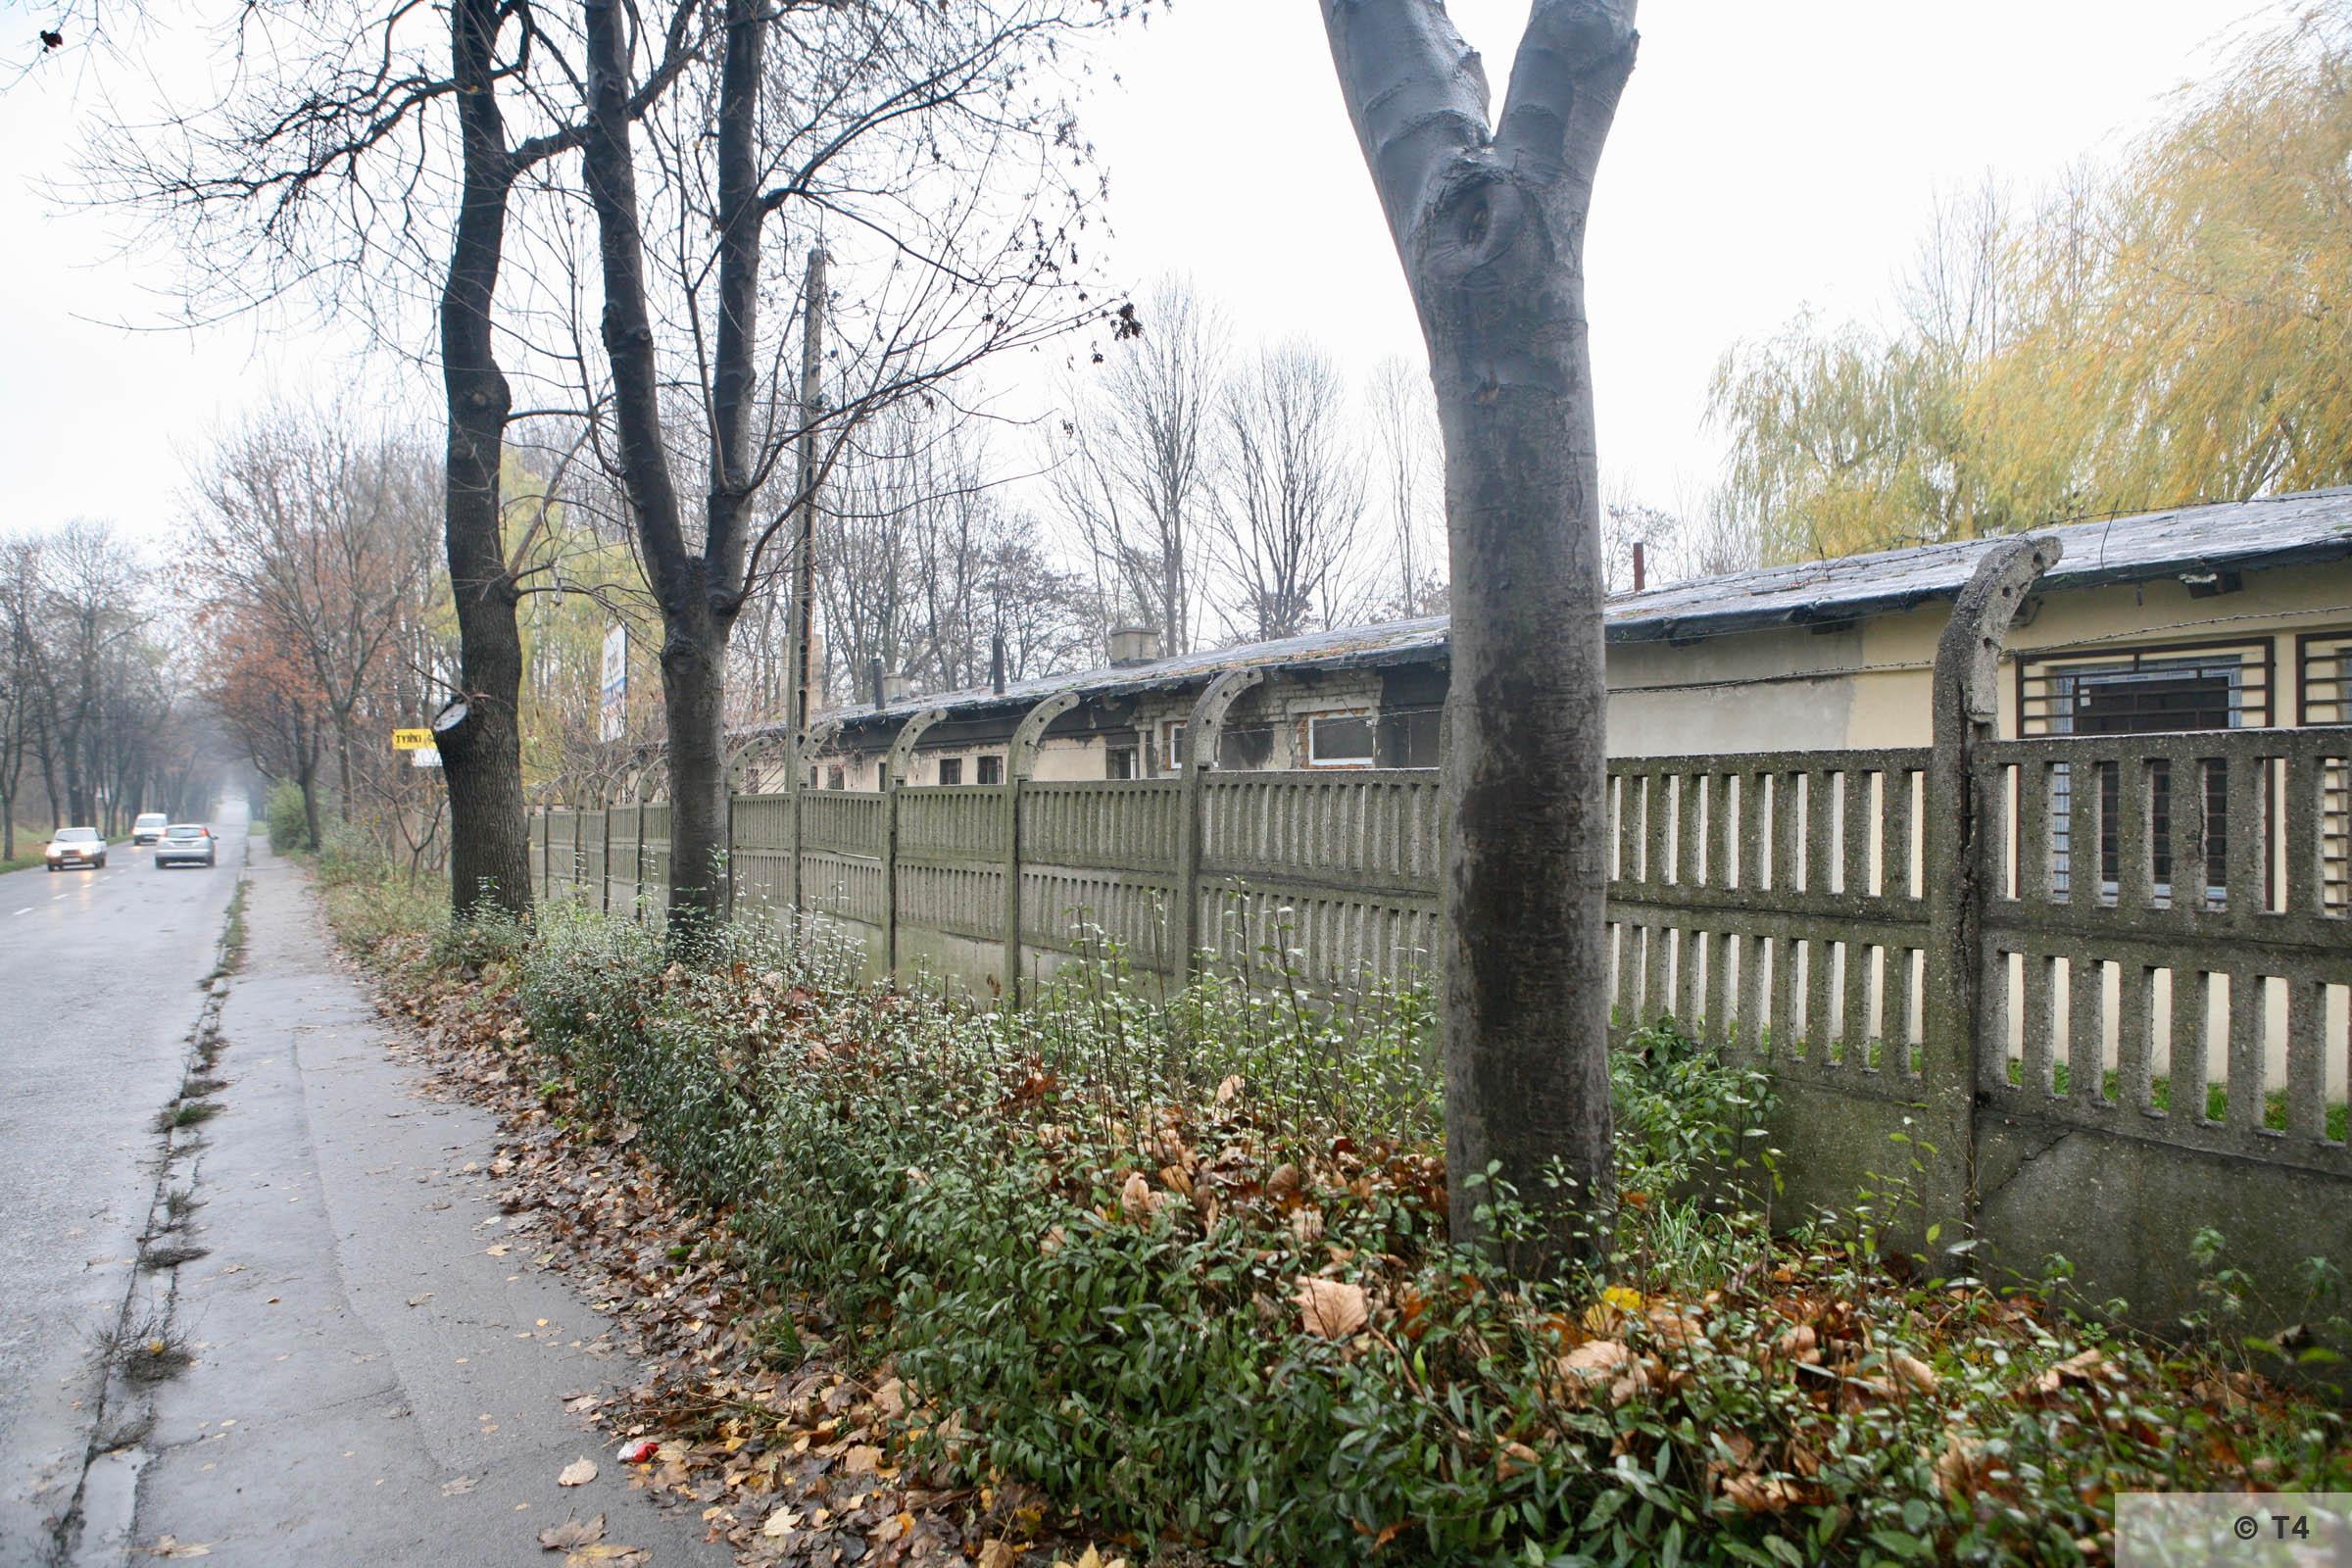 Area of Hindenburg sub camp. Prisoner barrcks on the right. 2007 T4. 3653